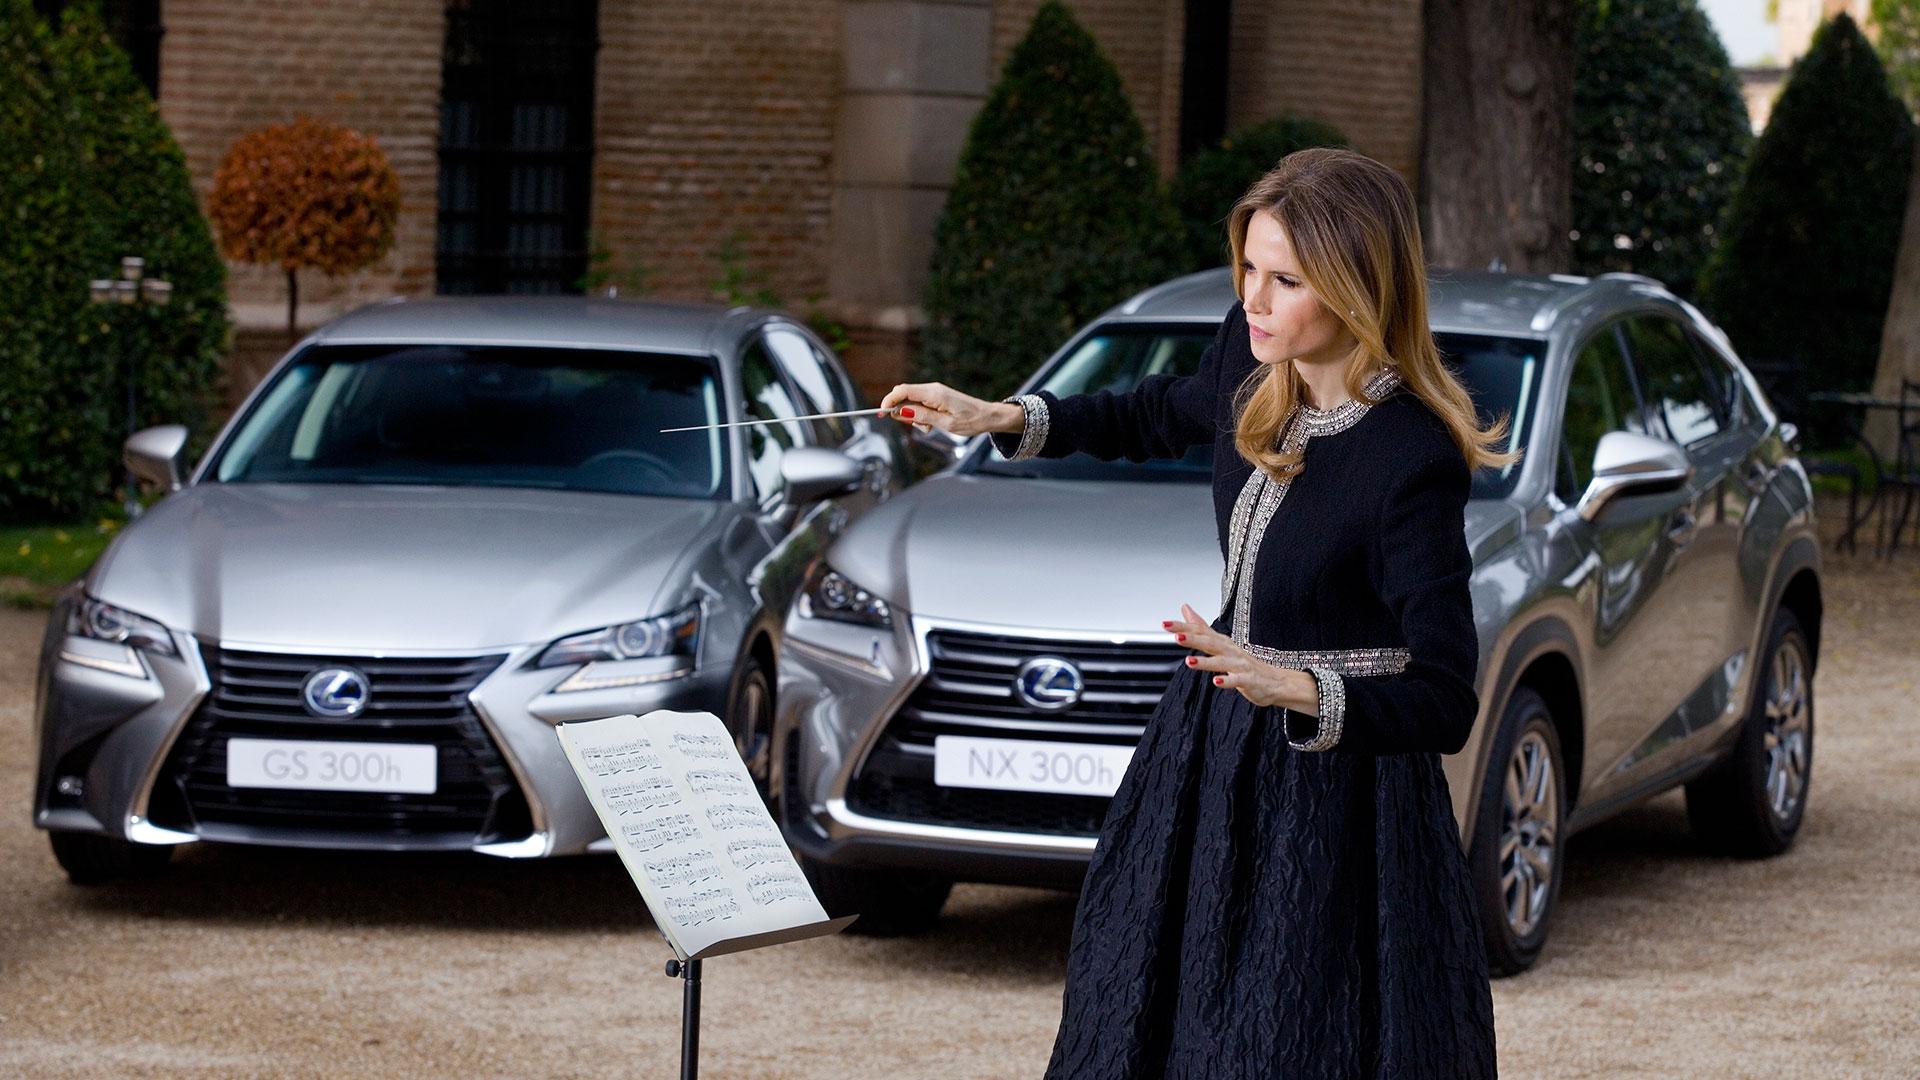 Inma Shara Lexus Excelencia hero asset